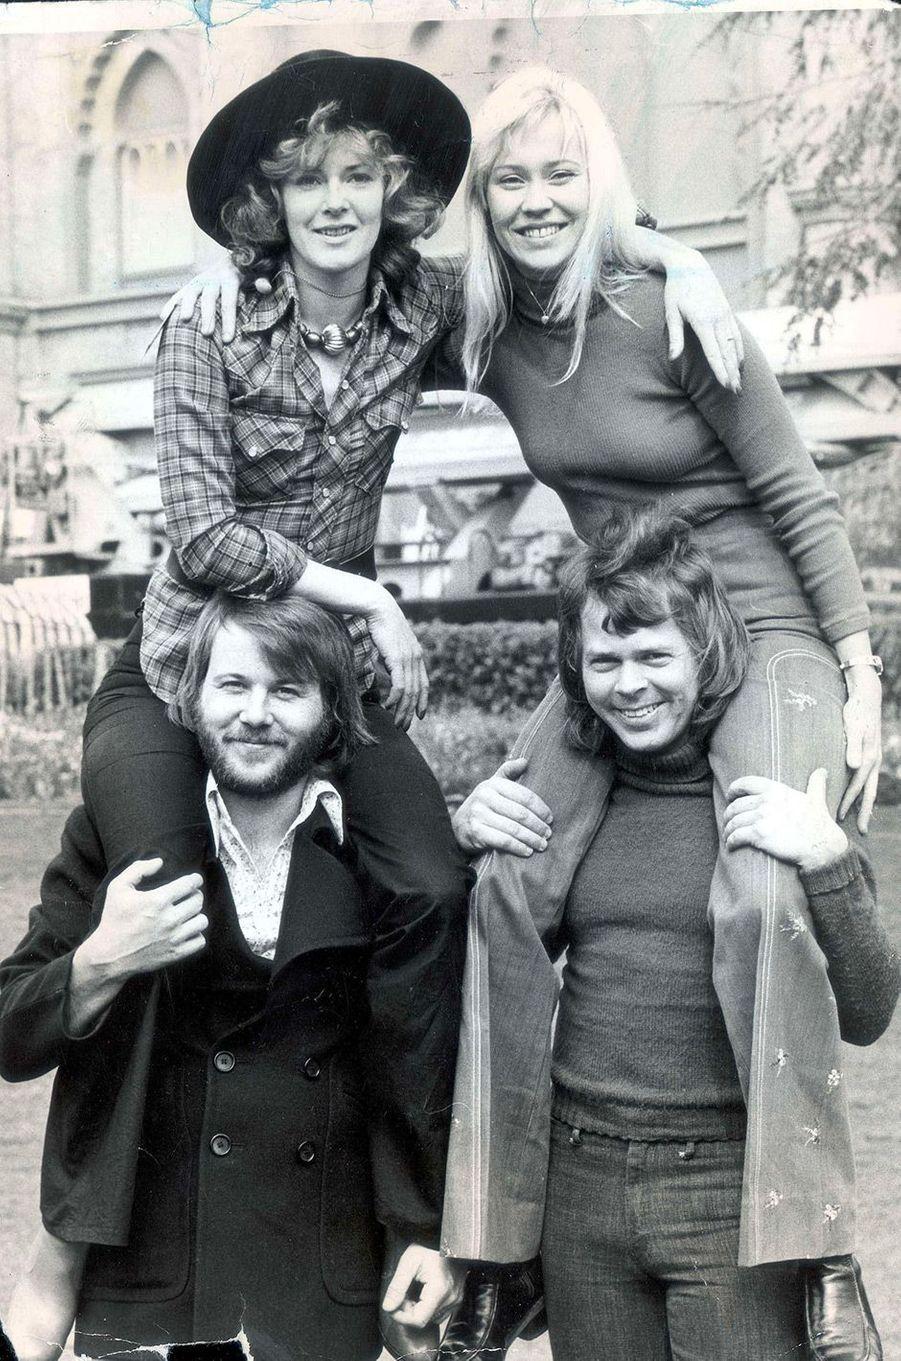 Le groupe ABBA en 1974